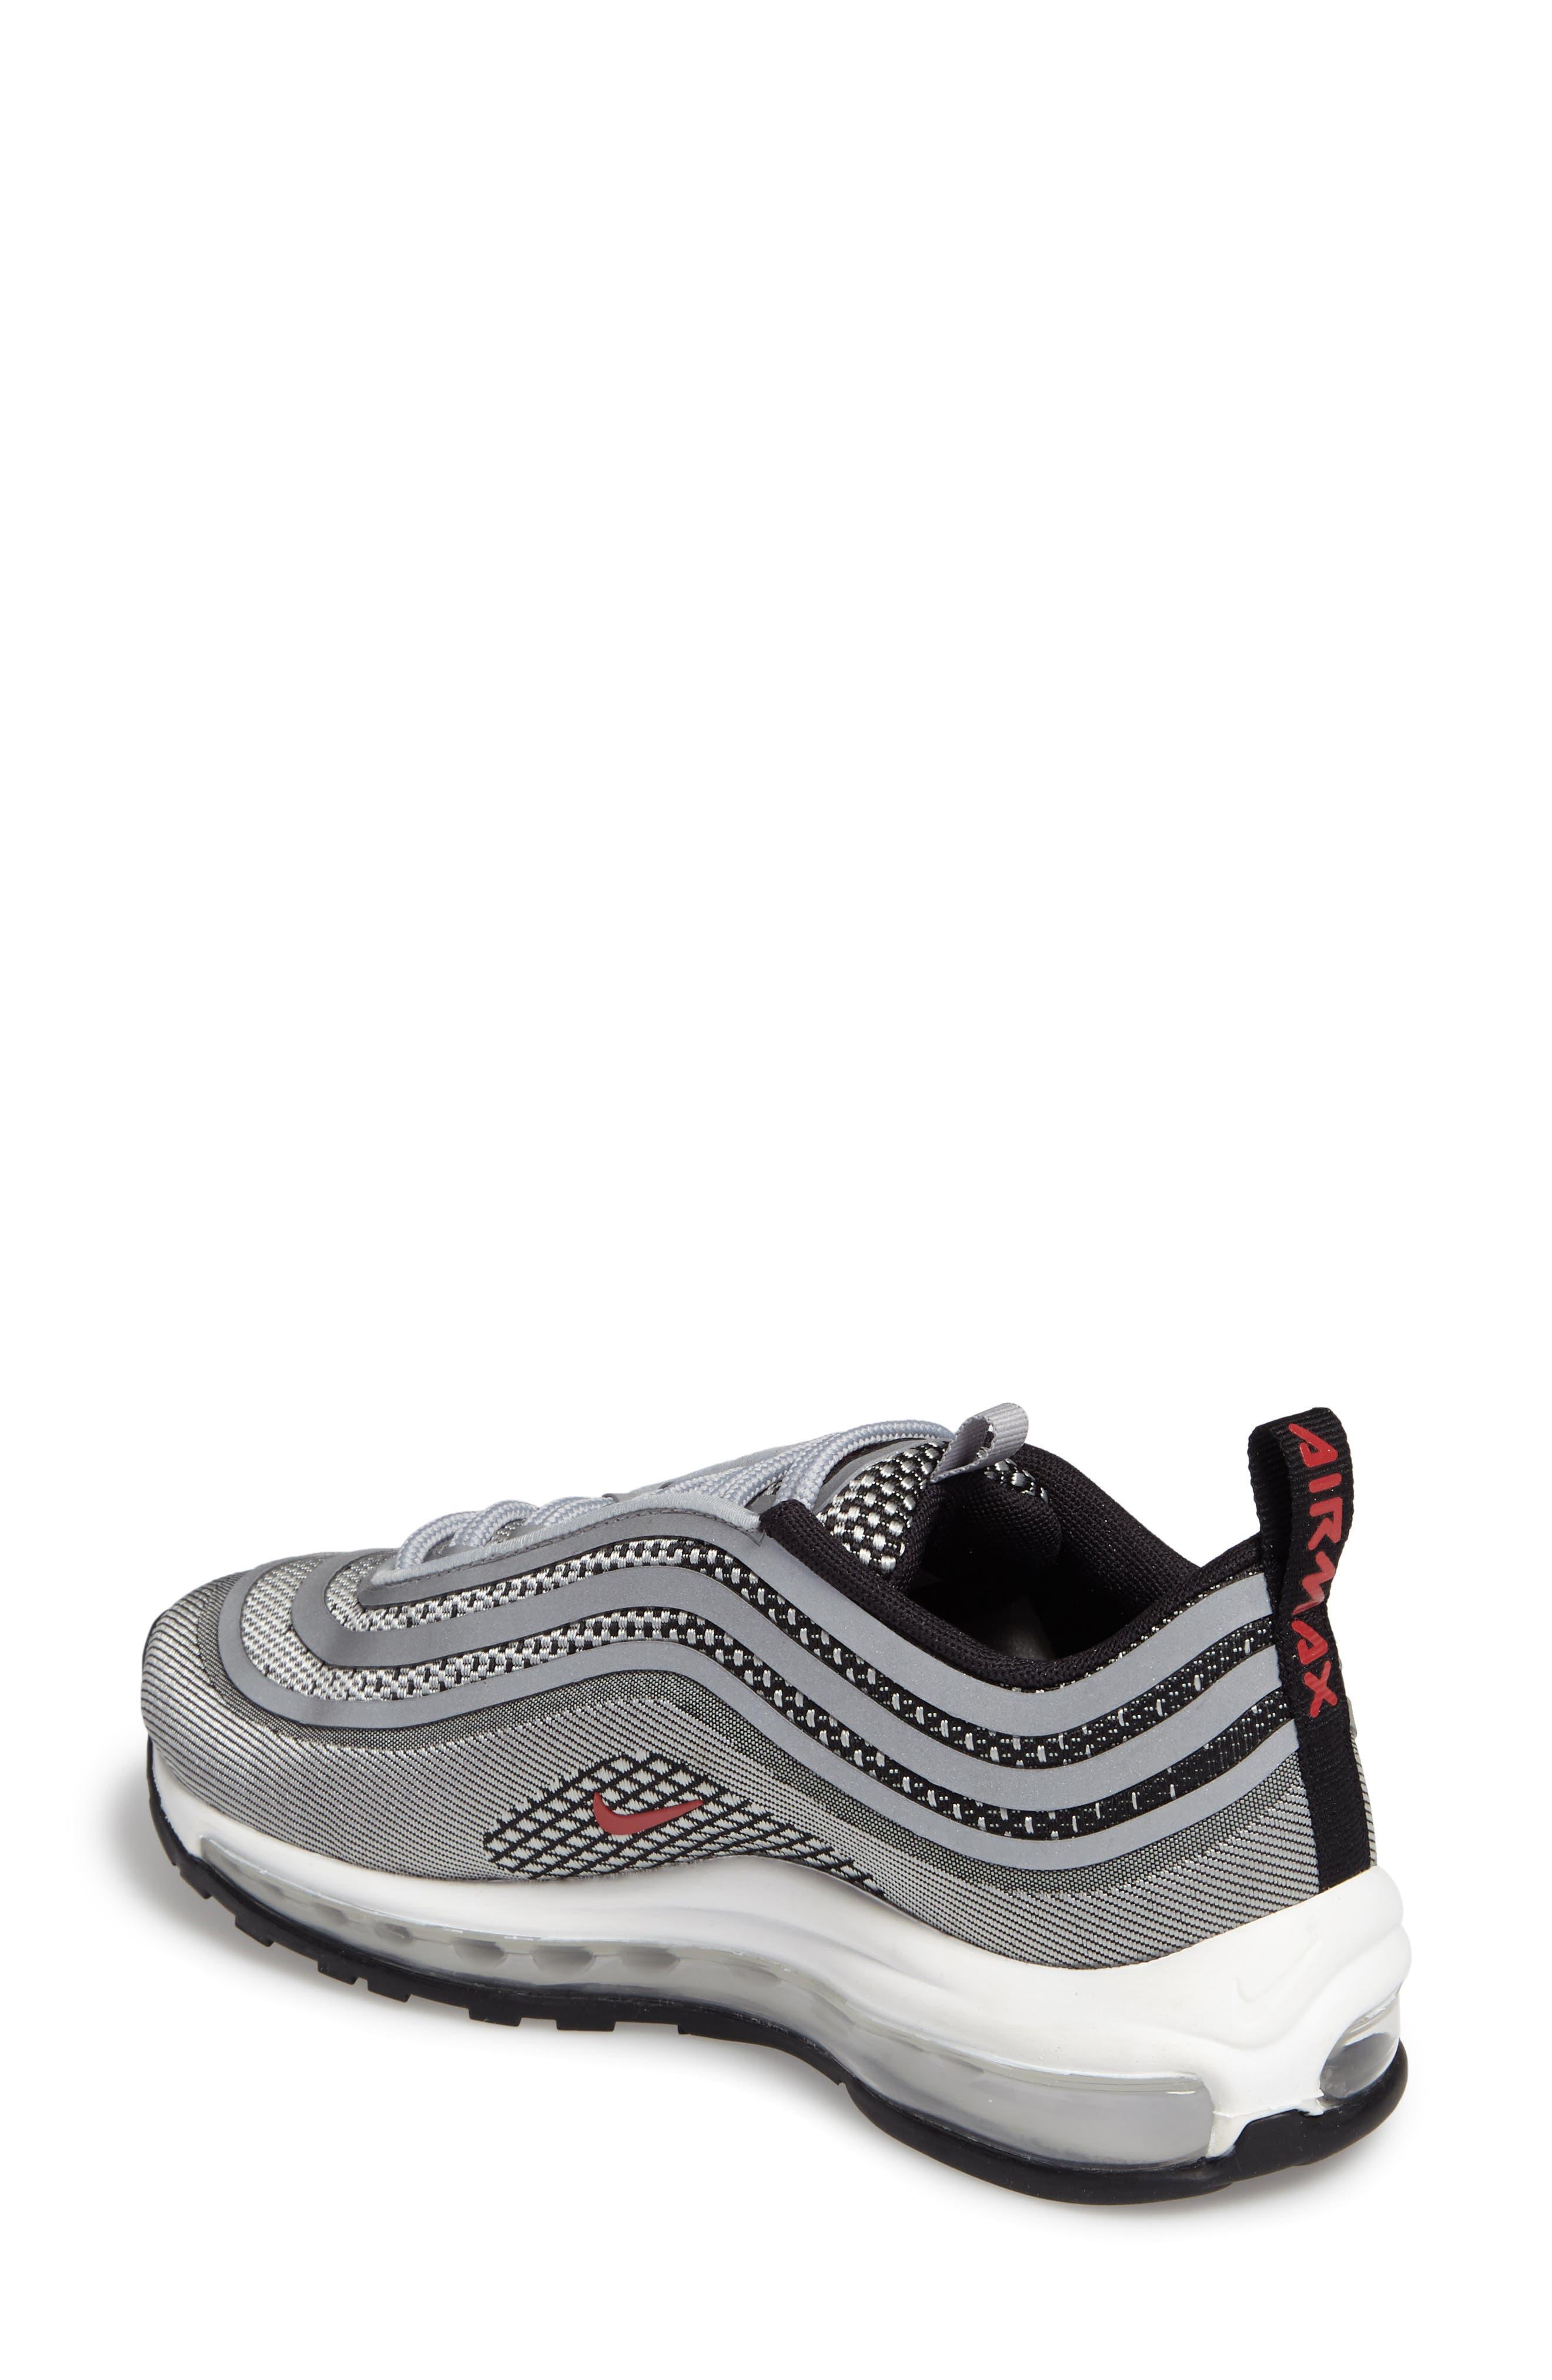 Air Max 97 Ultralight 2017 Sneaker,                             Alternate thumbnail 2, color,                             Metallic Silver/ Varsity Red